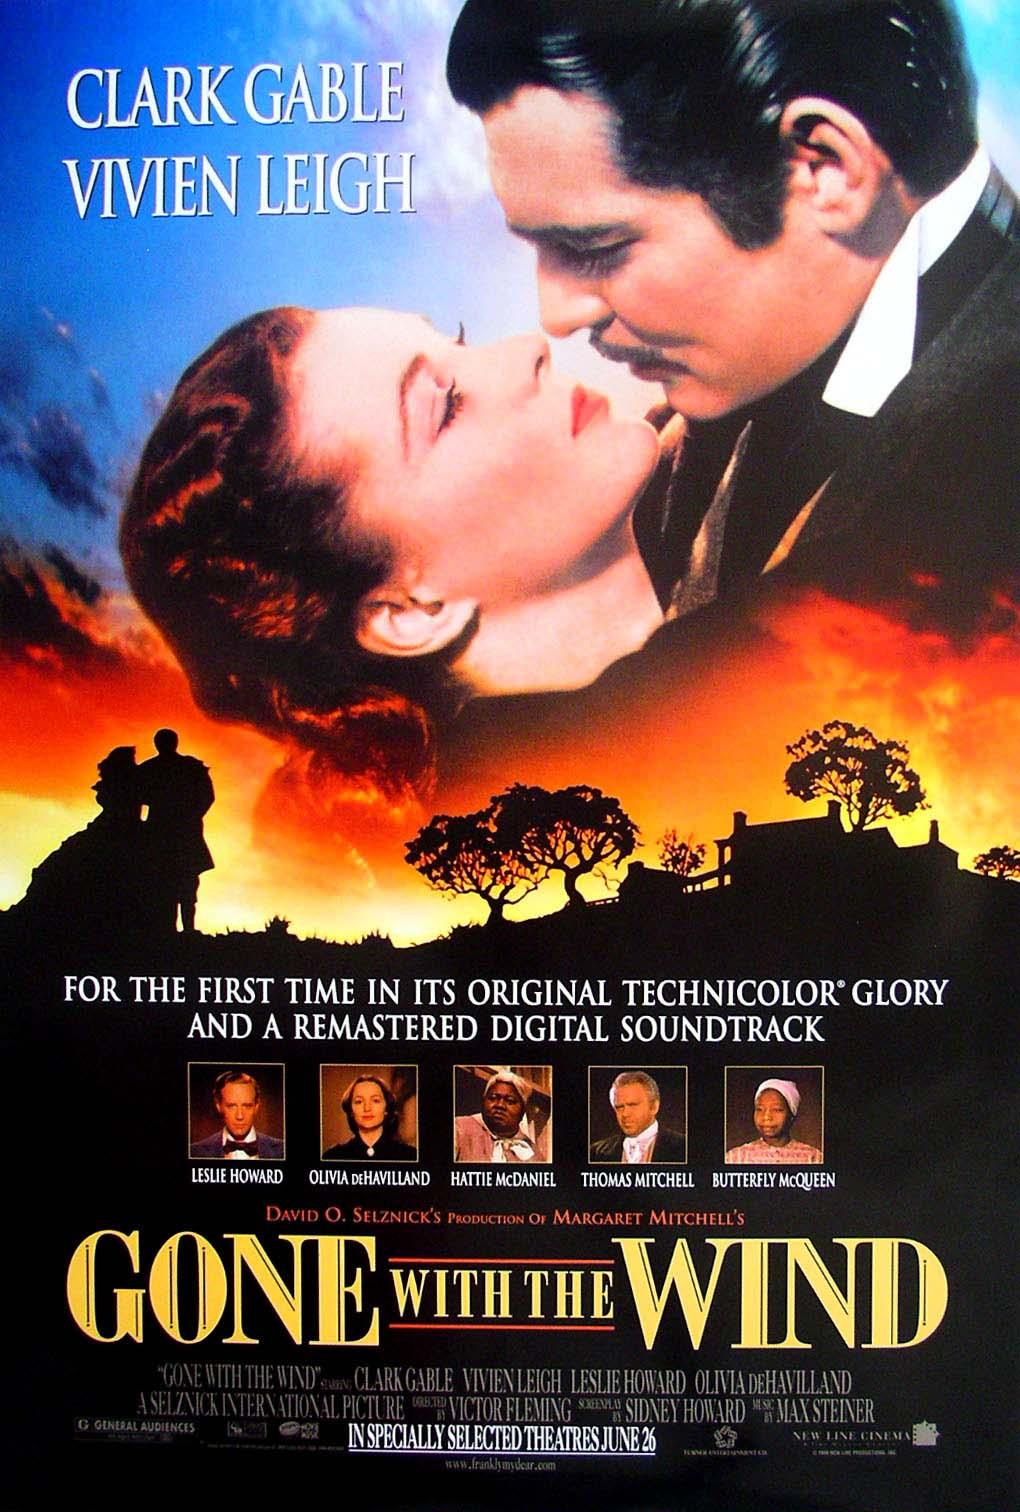 greatest movie ever made!